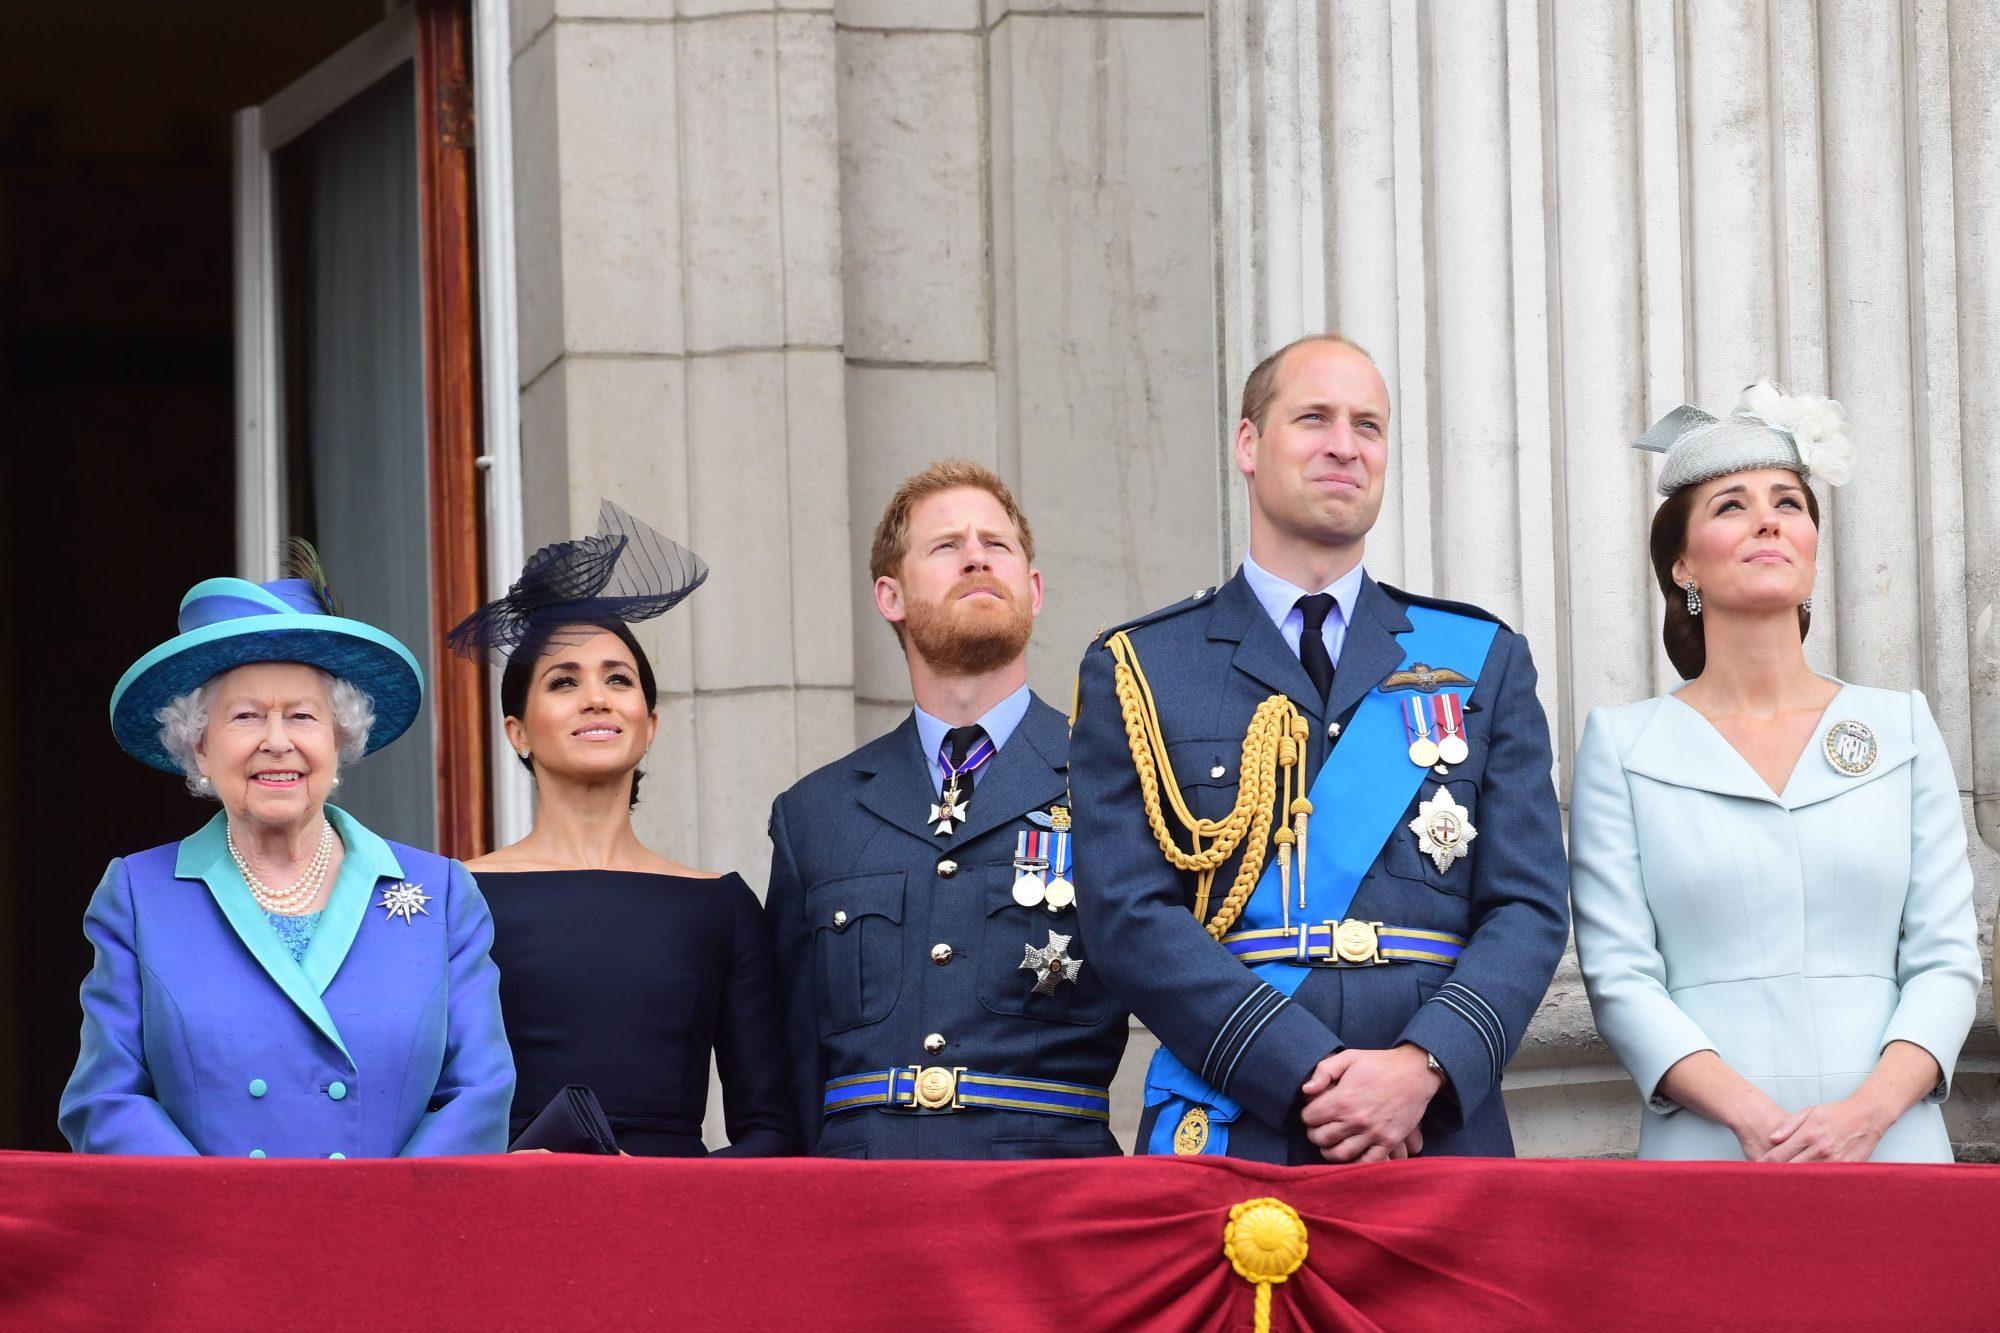 Royal family Britain